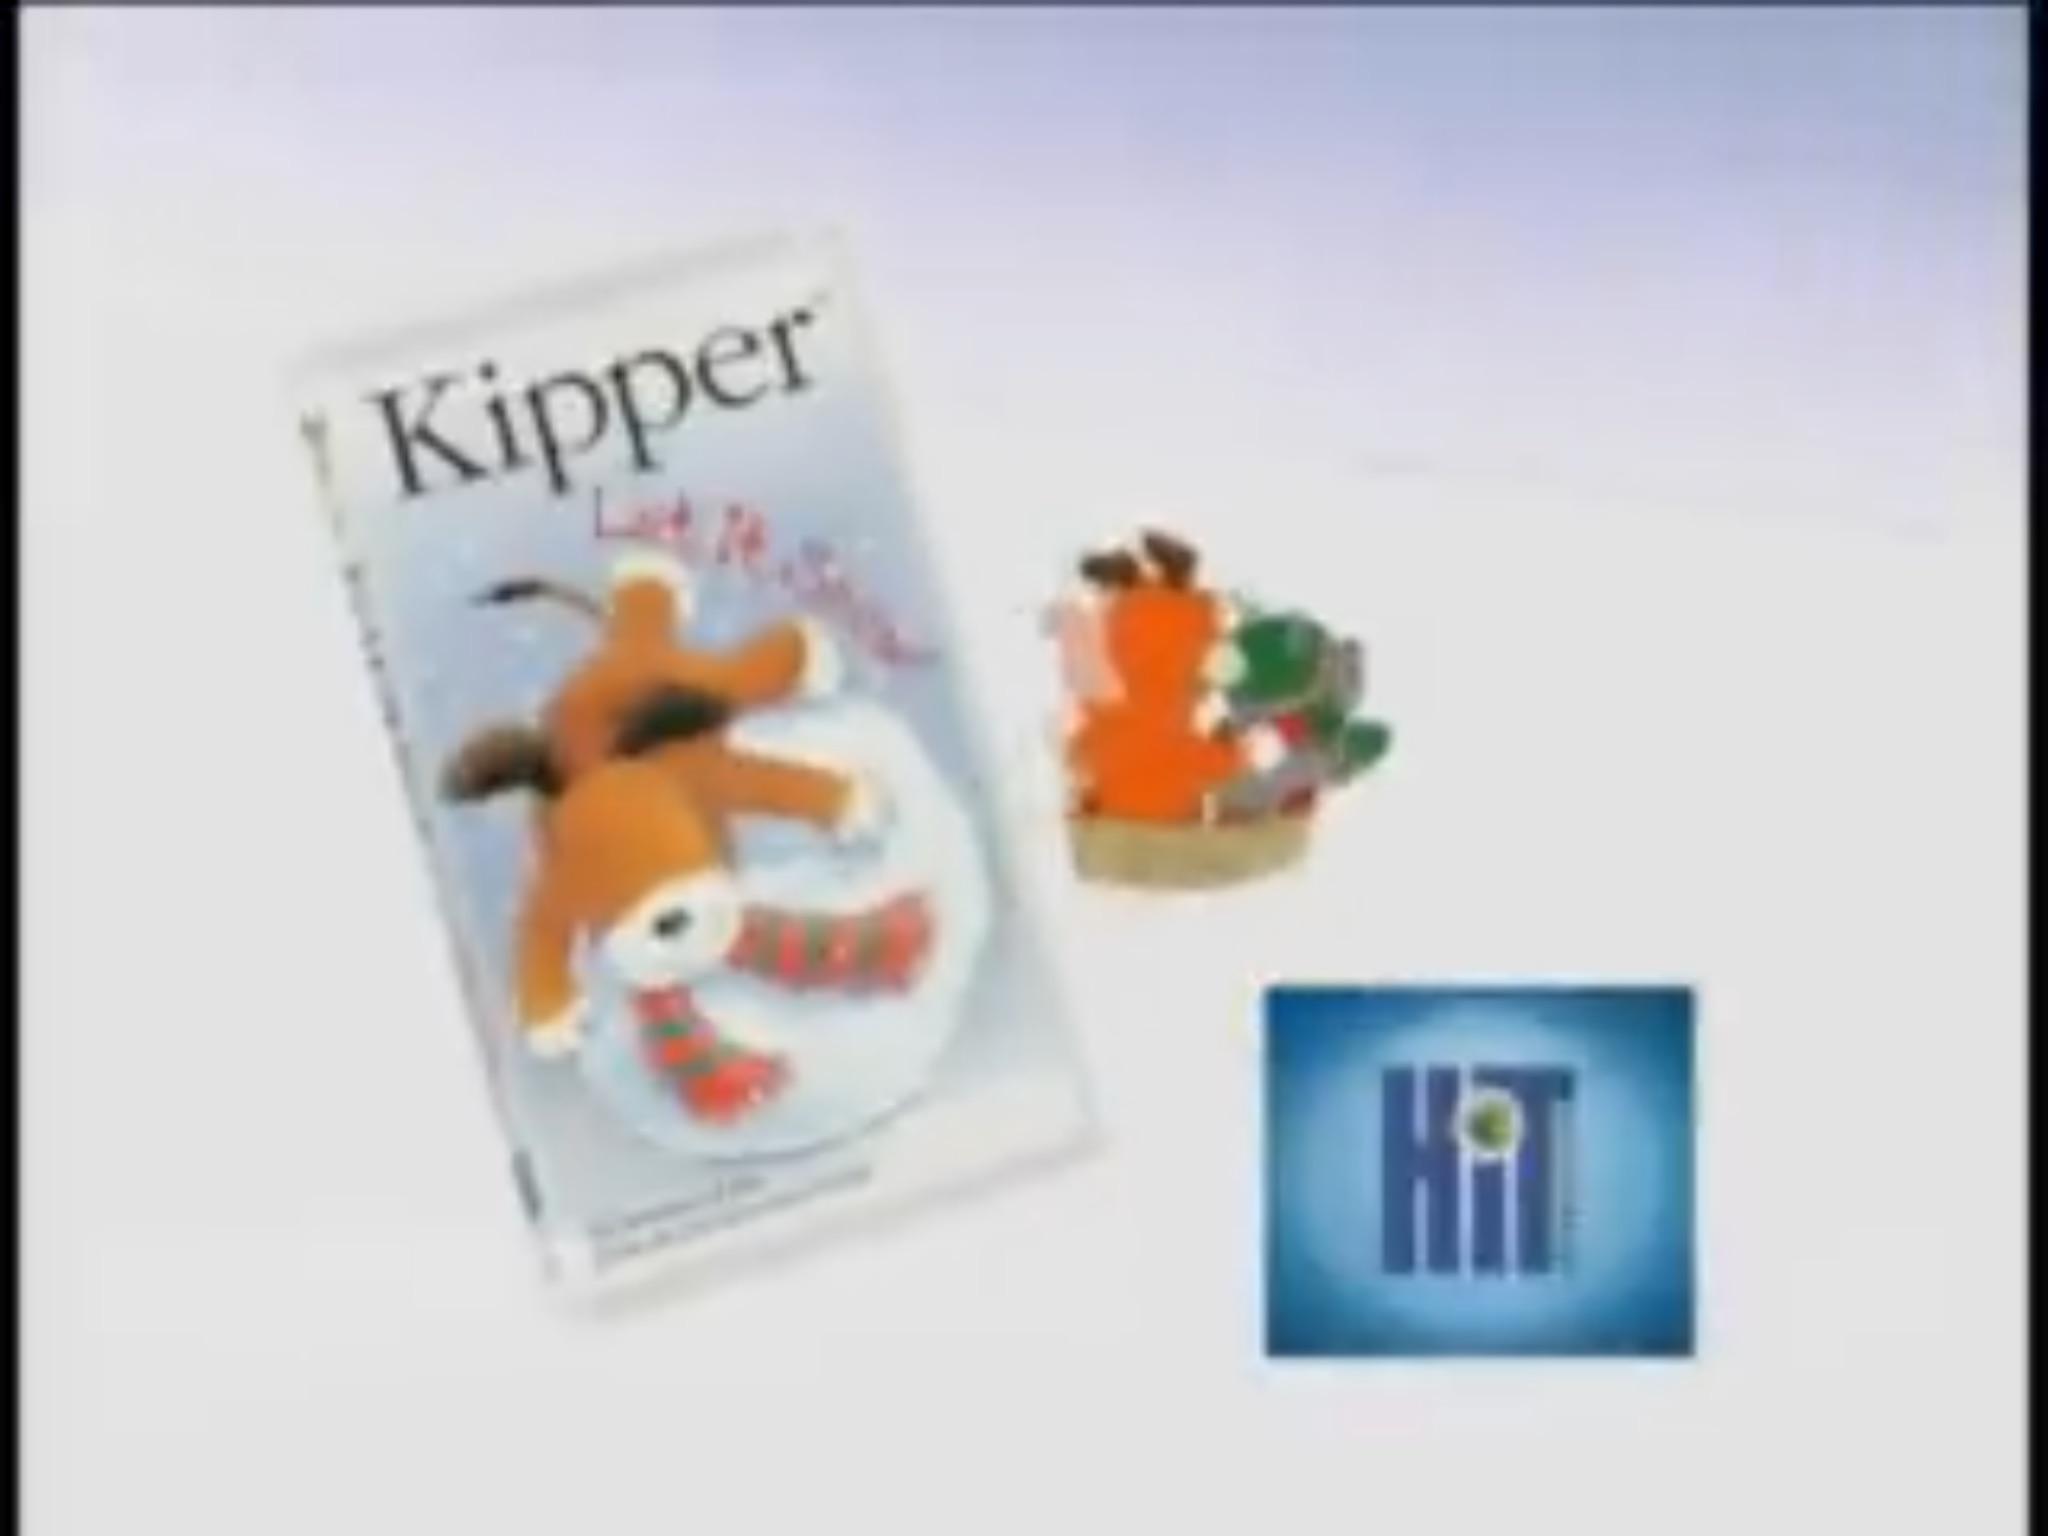 Kipper: Let it Snow! Trailer